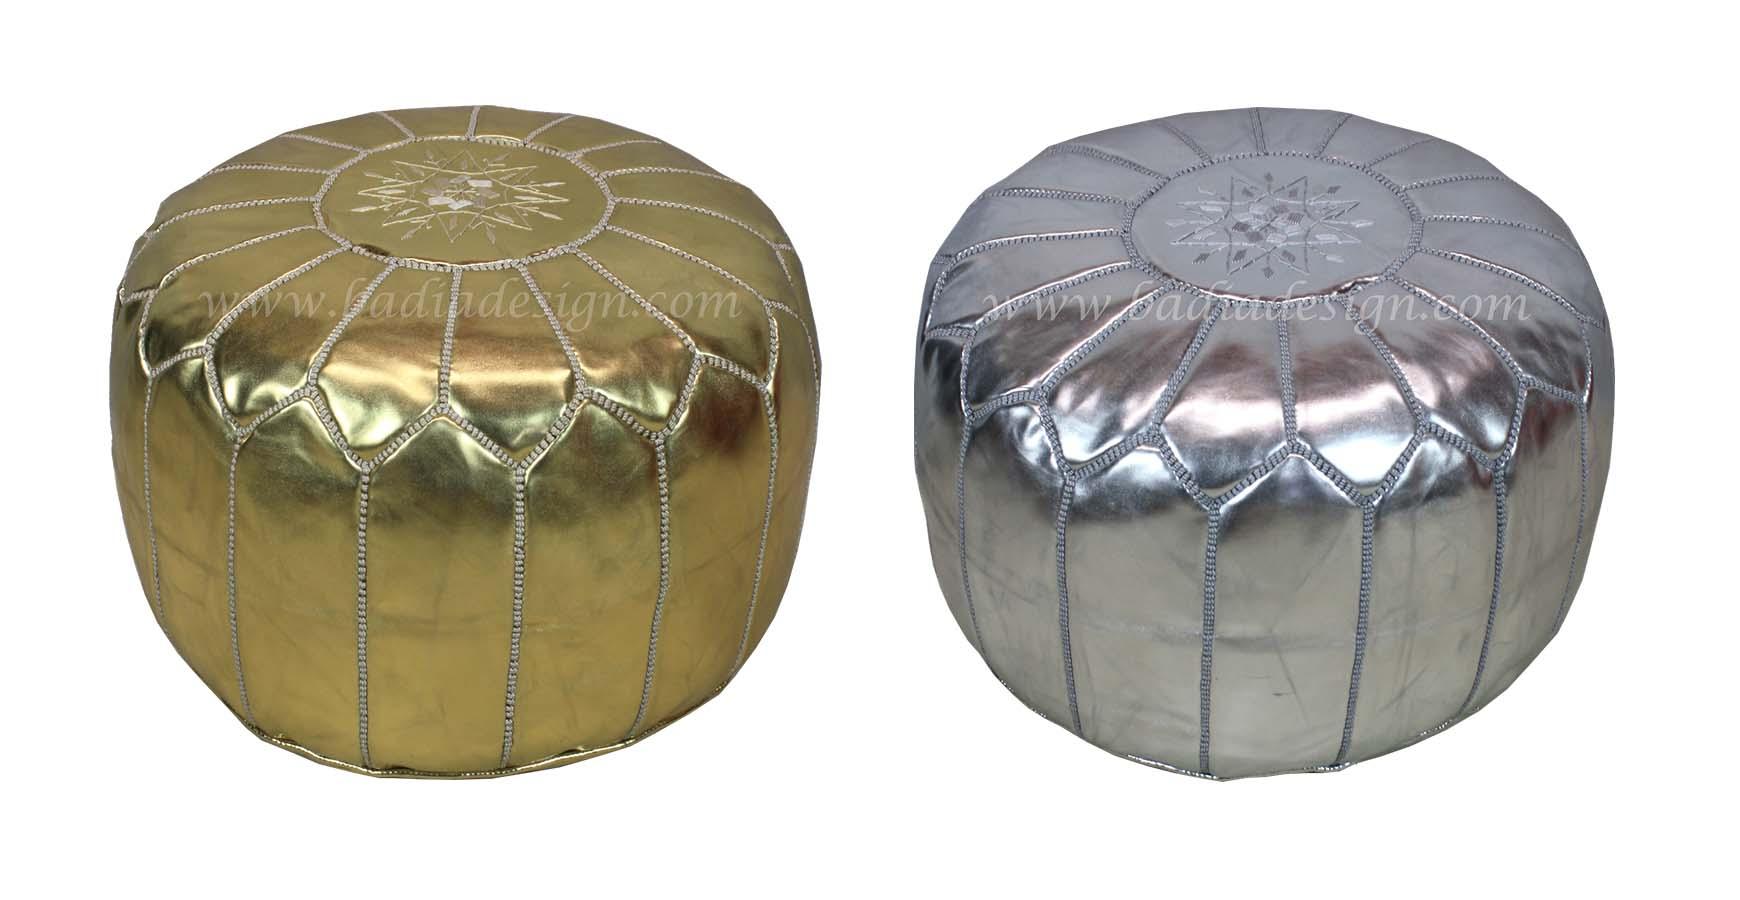 moroccan-metallic-round-leather-pouf-mrlp004.jpg